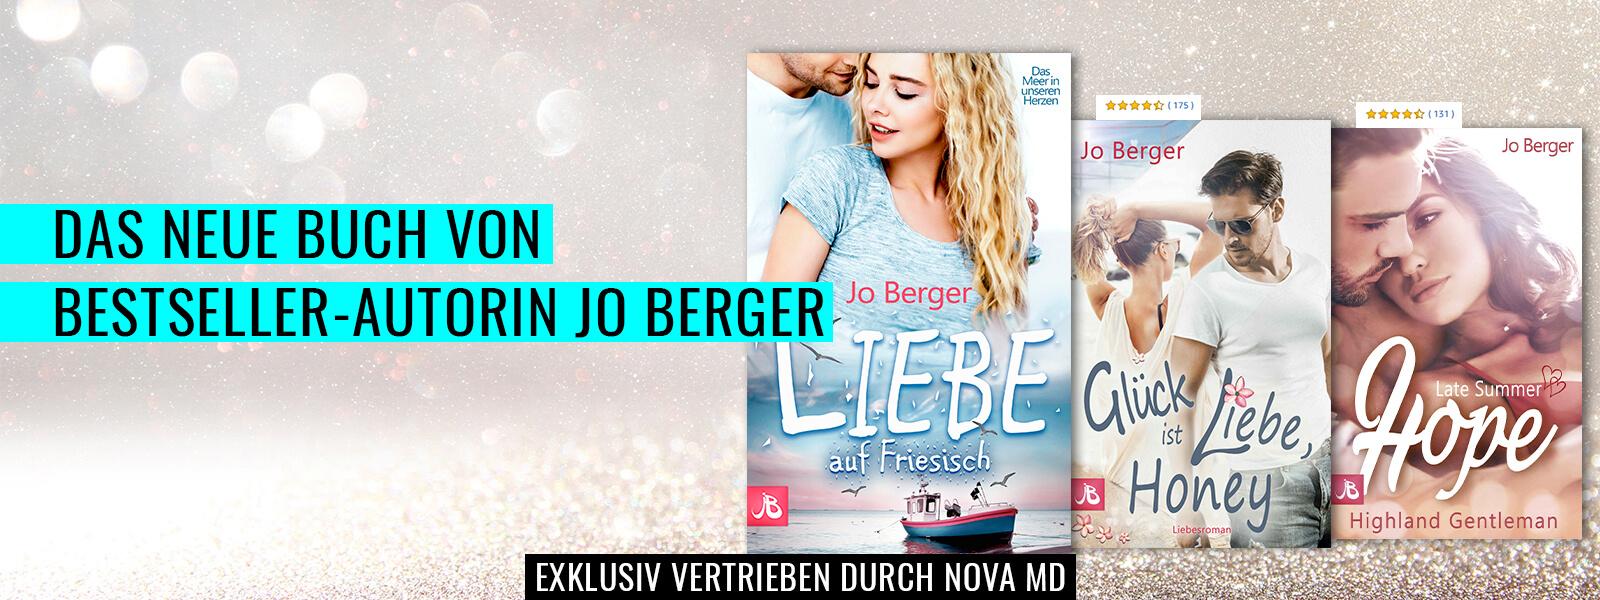 "Jo Bergers neuer Liebesroman ""Liebe auf friesisch"""